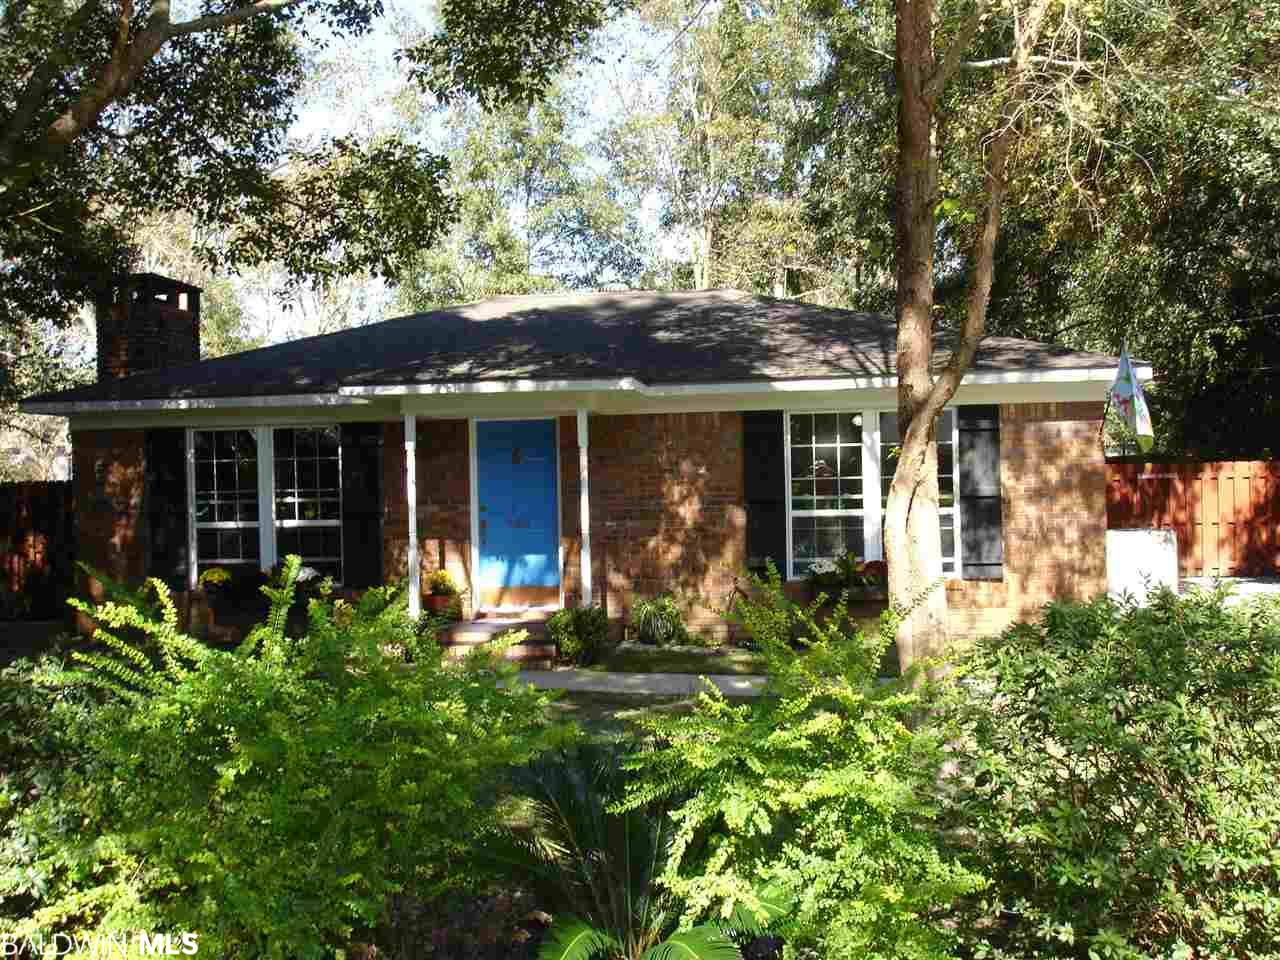 420 W Section Ave, Foley, AL, 36535